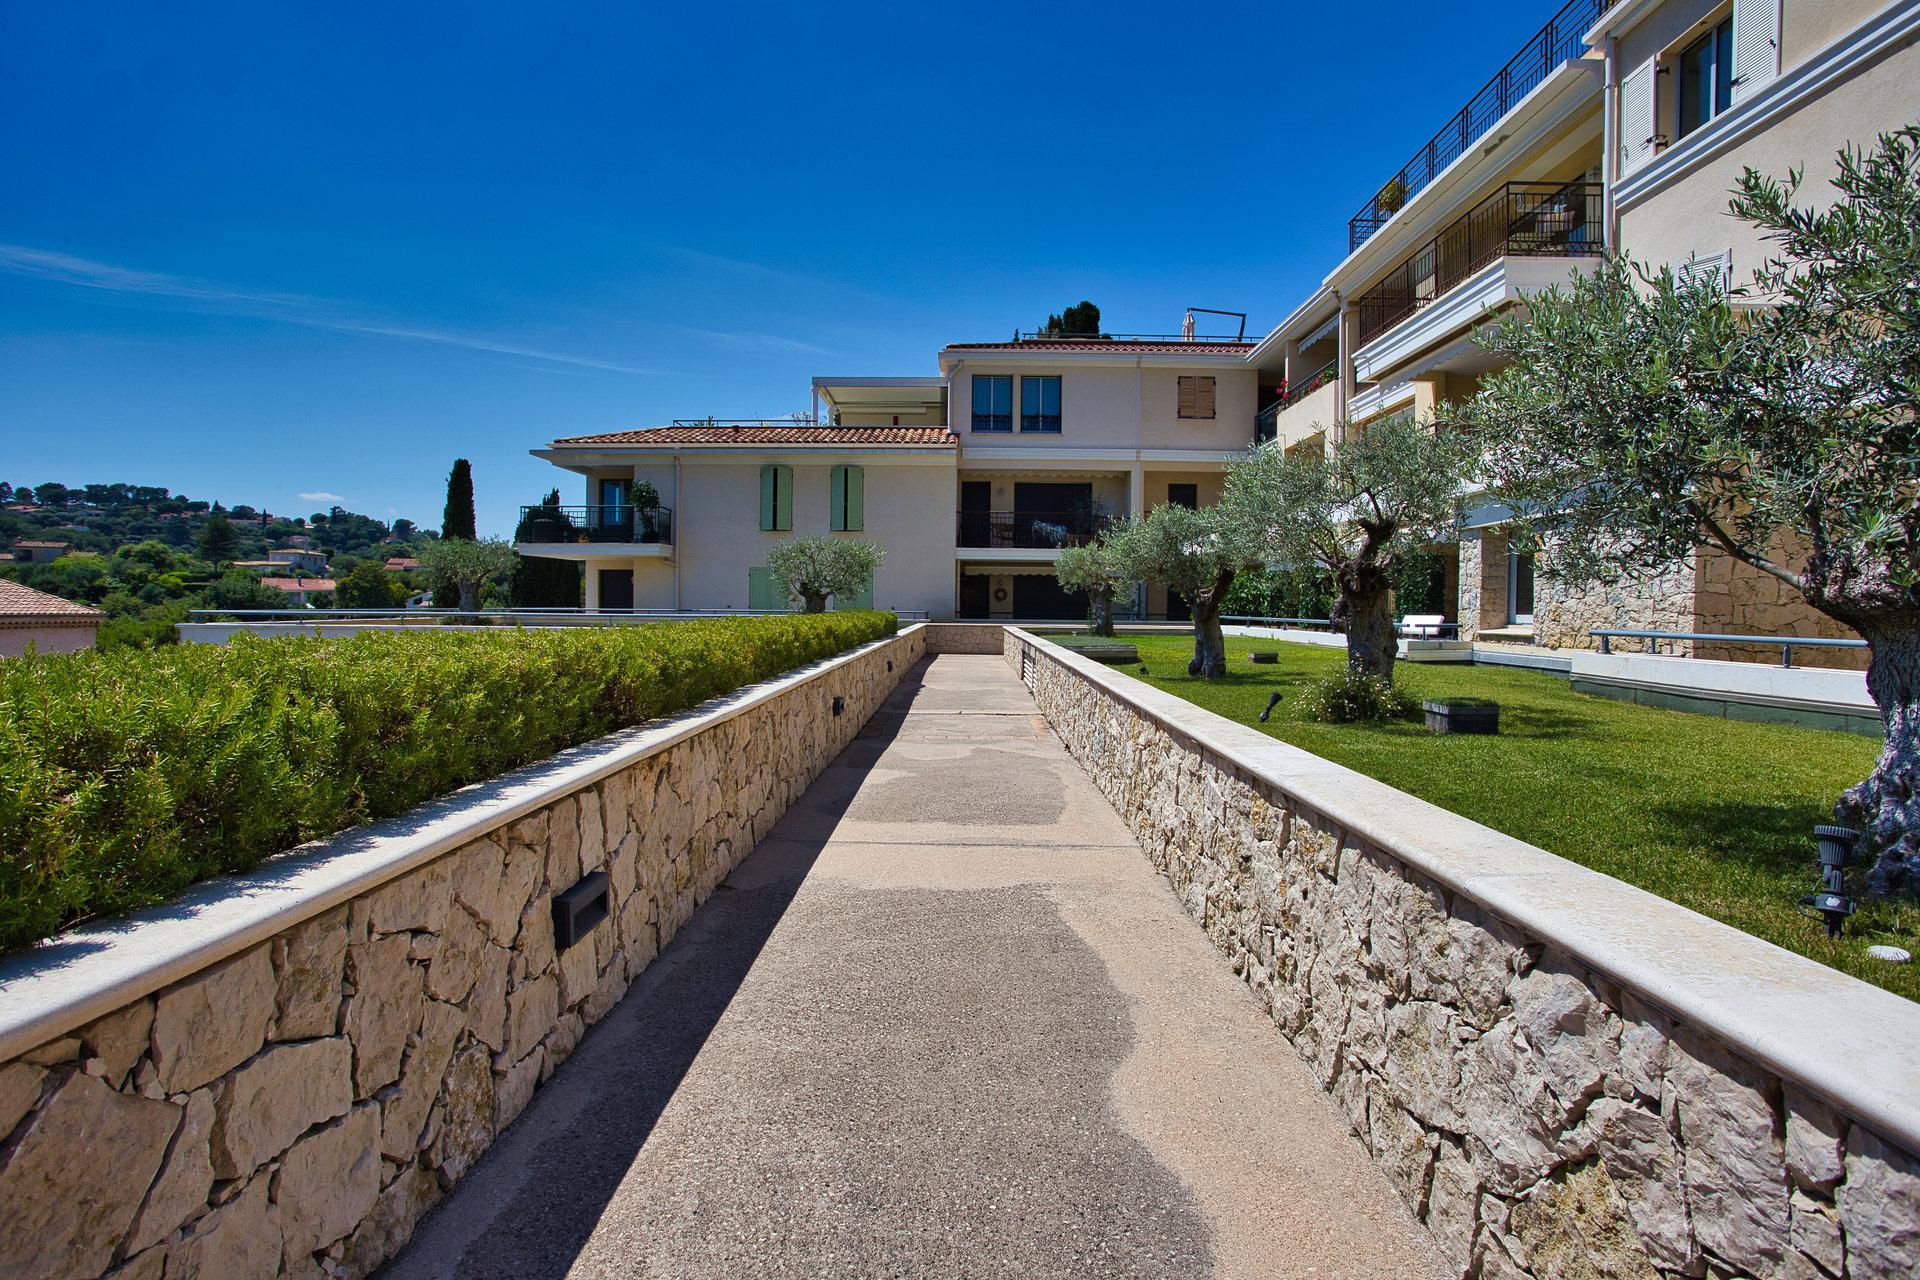 2 bedroom flat near Sophia, Beaches, Golf, Biot Village